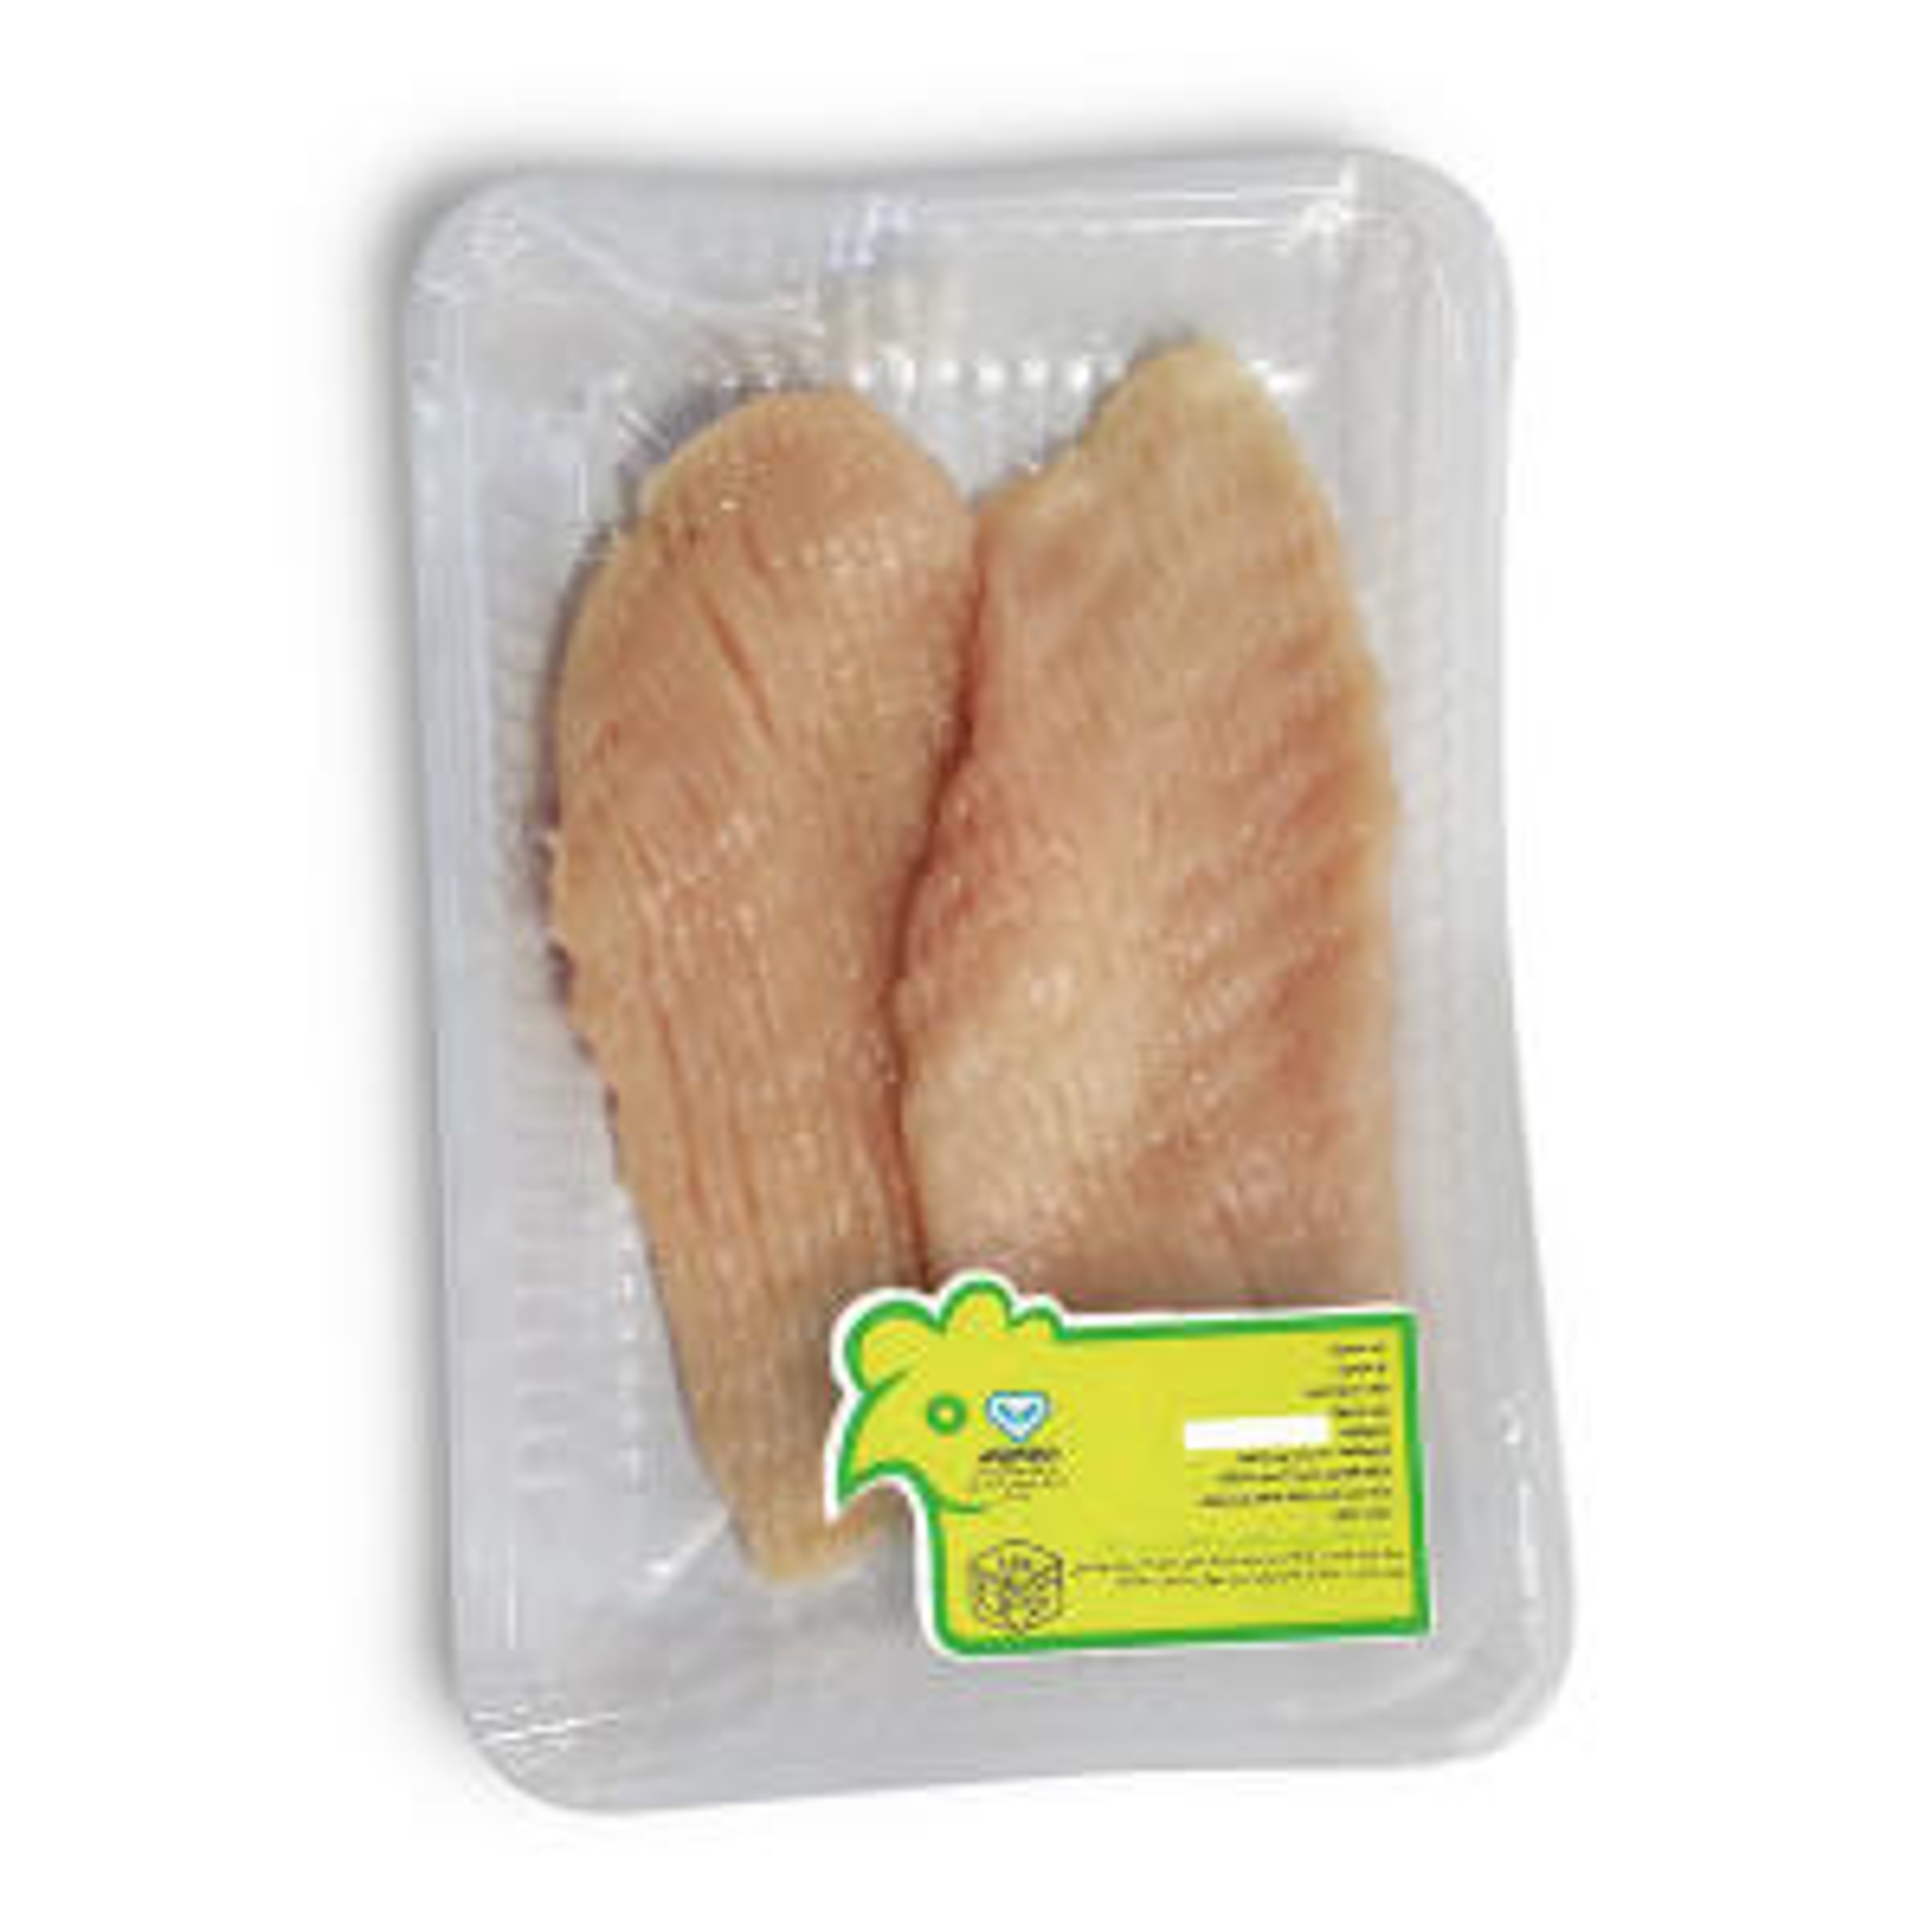 سینه بیفتکی مرغ دارا - 1 کیلوگرم